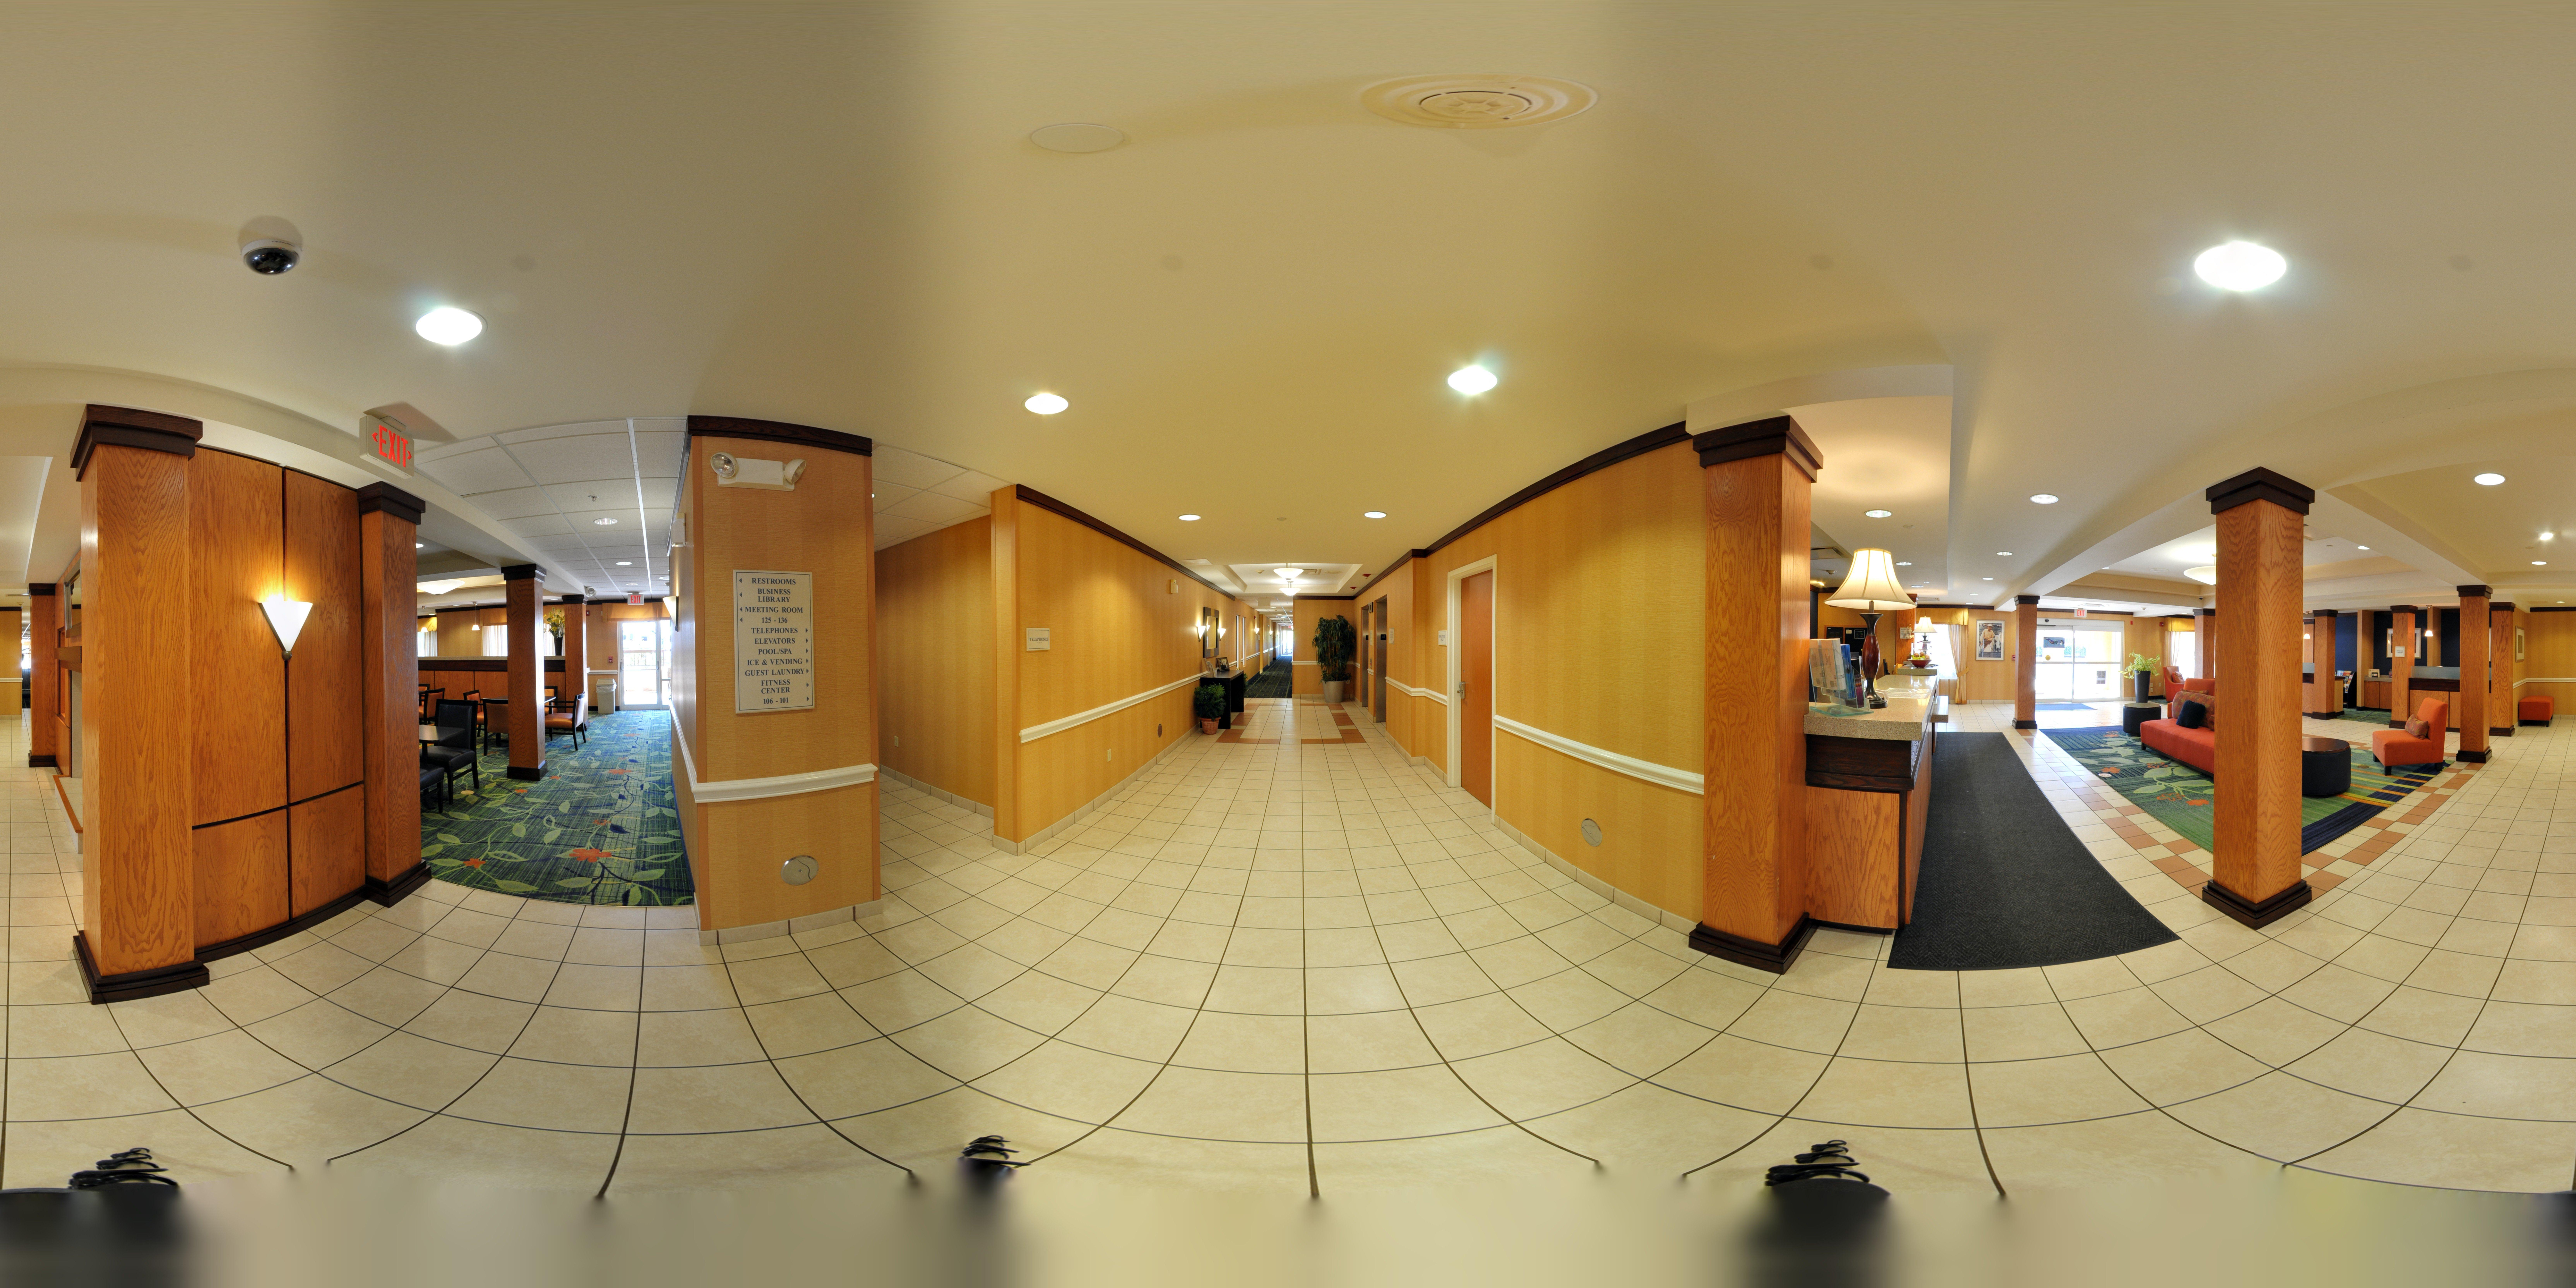 Fairfield Inn & Suites by Marriott Akron South image 37